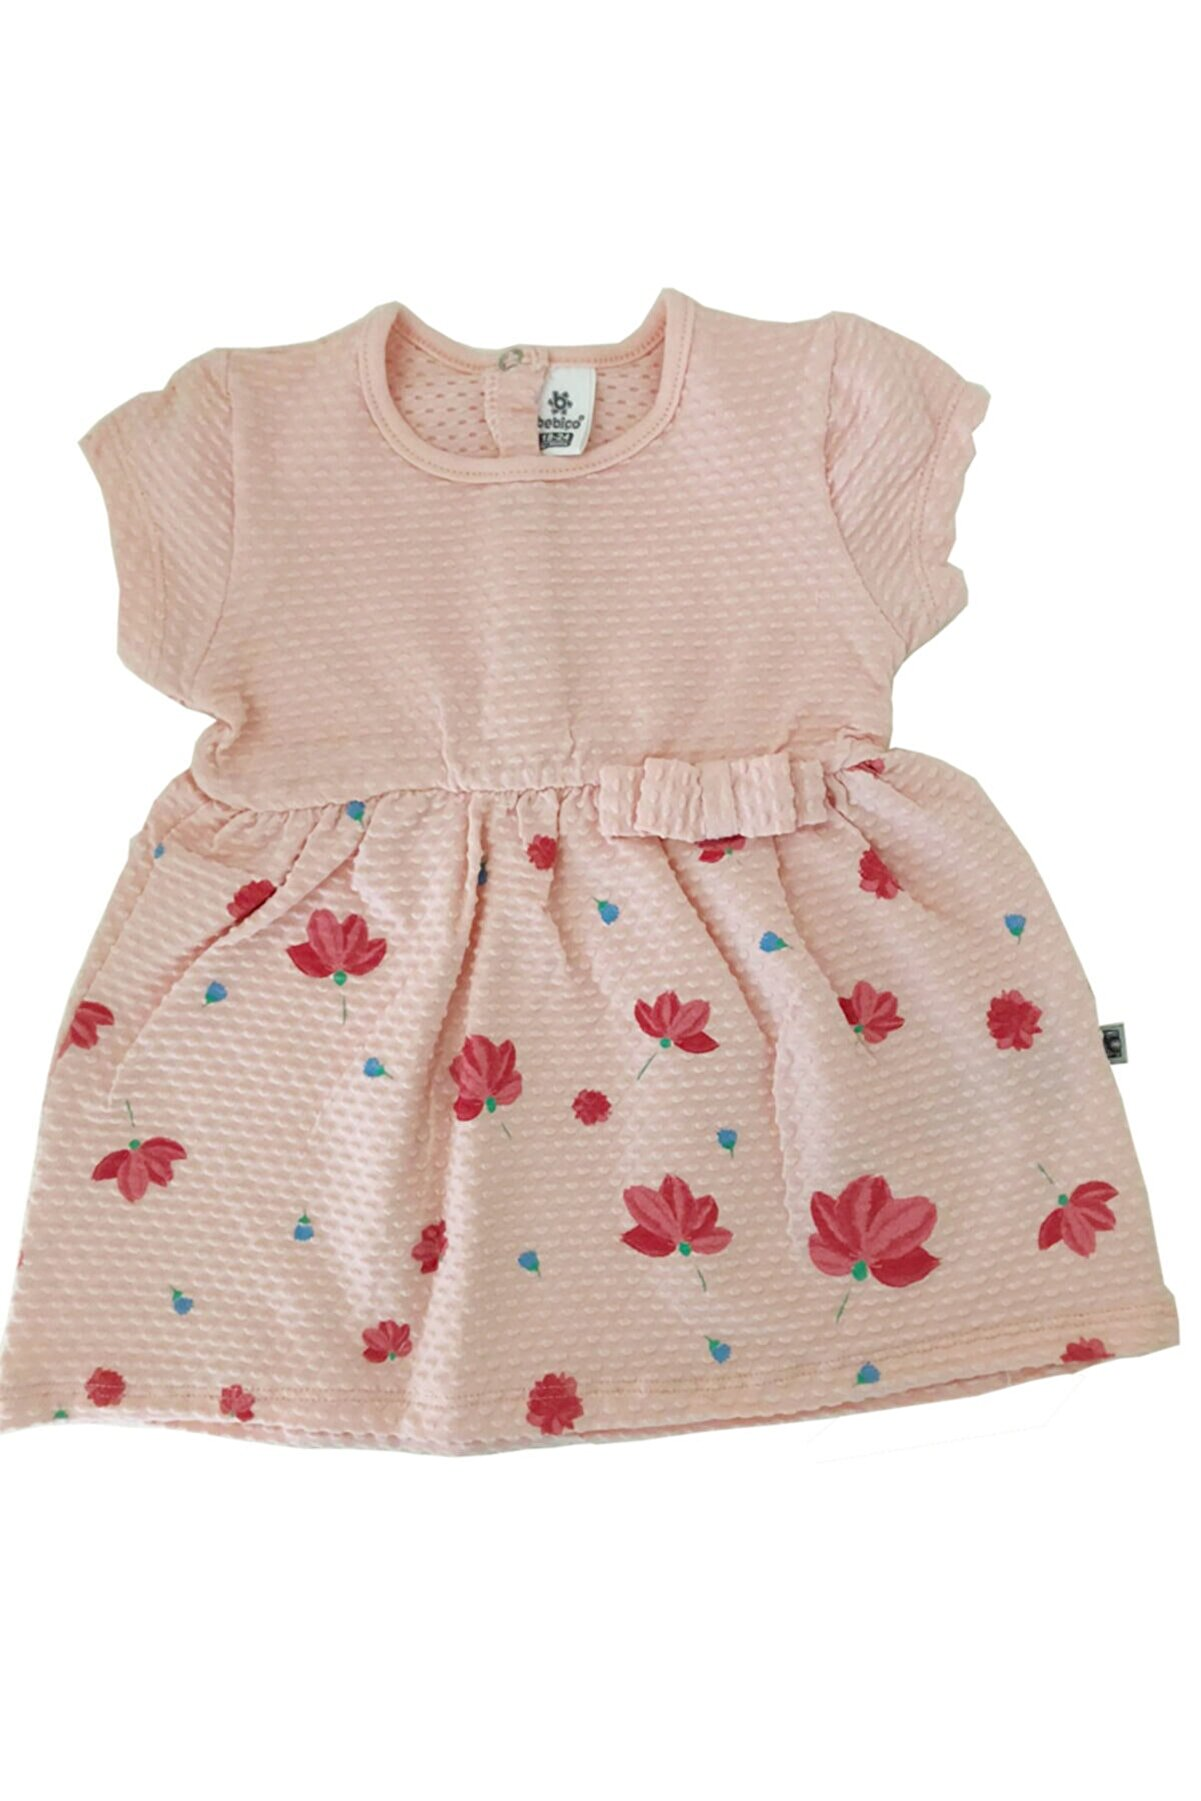 BEBİÇO KİDS Kız Bebek Pembe  Elbise